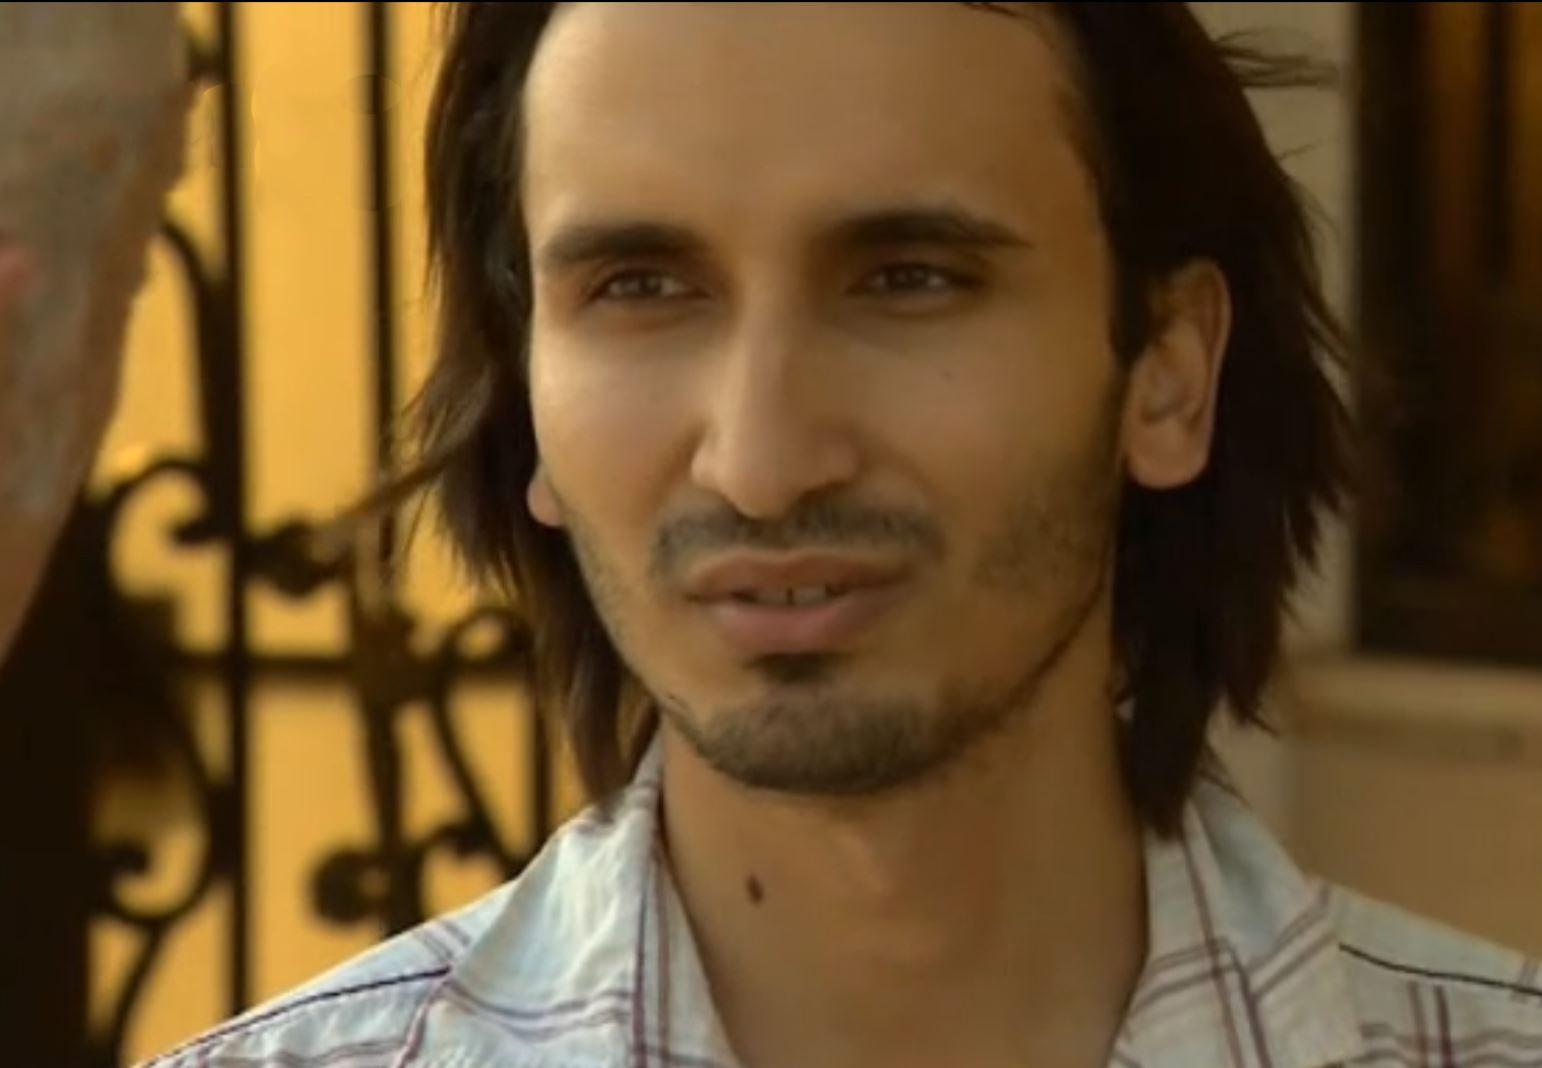 Khalid al-Megrahi